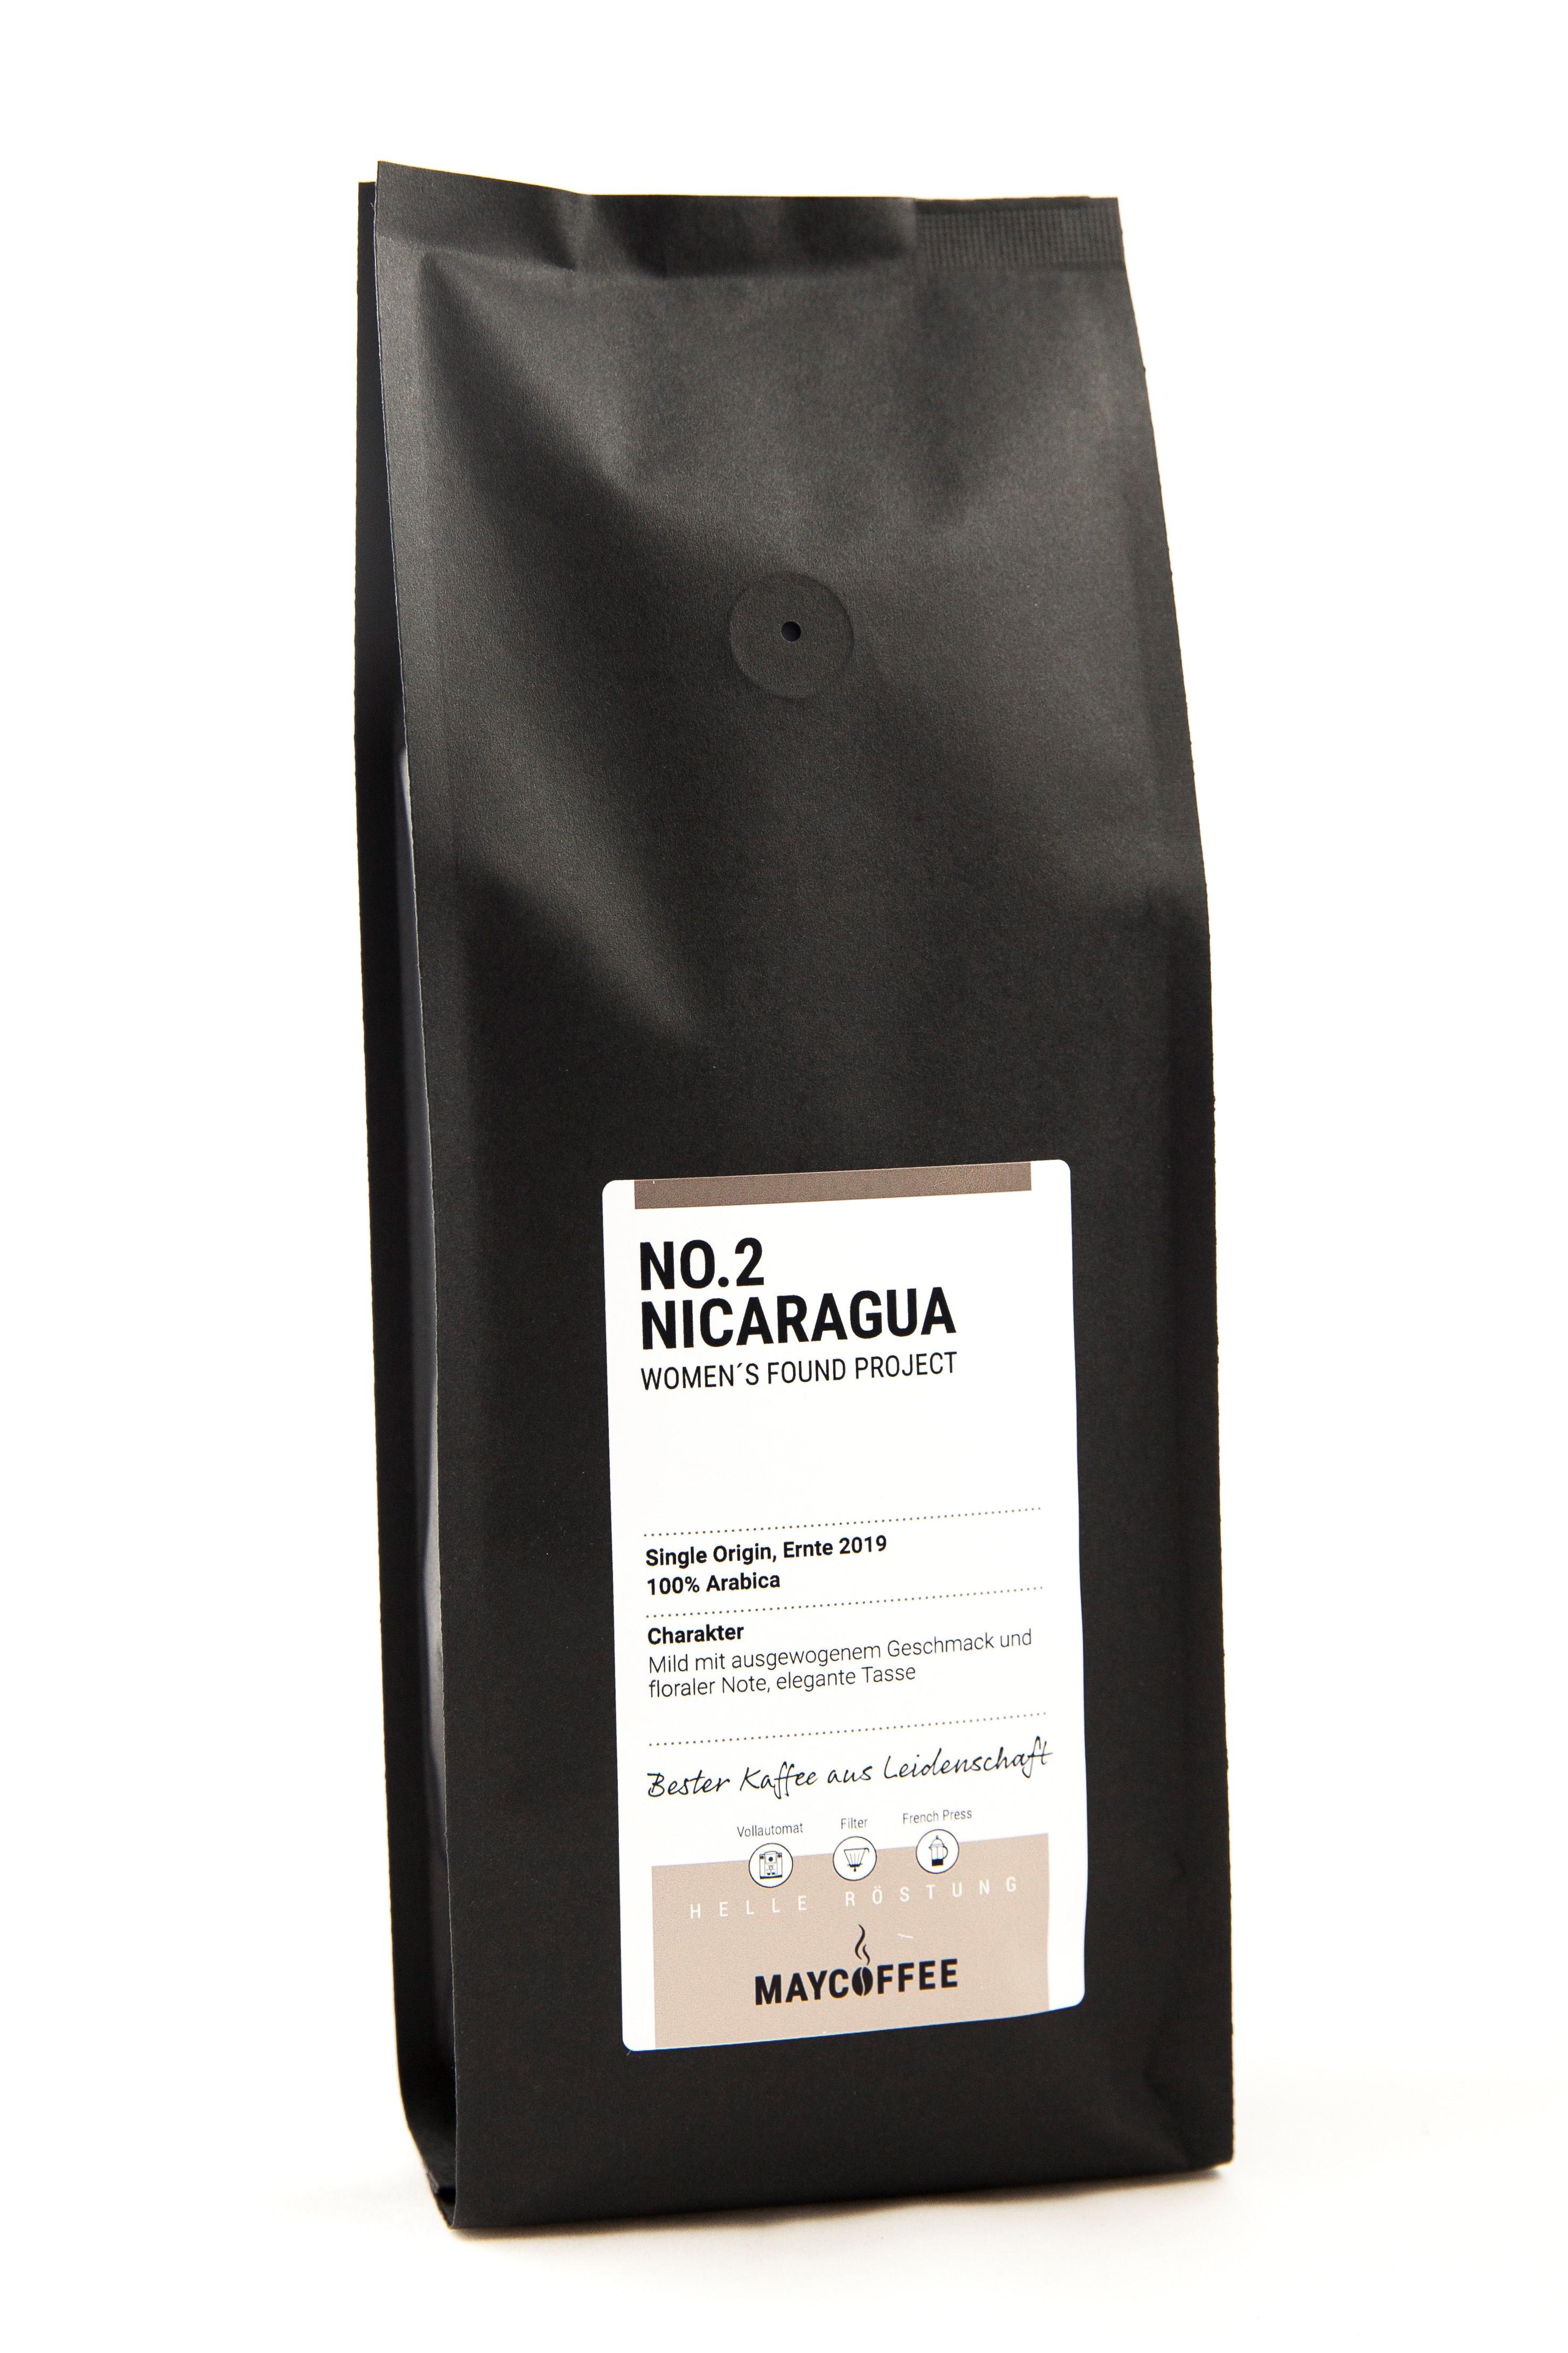 MAYCOFFEE NO. 2 Nicaragua Kaffee